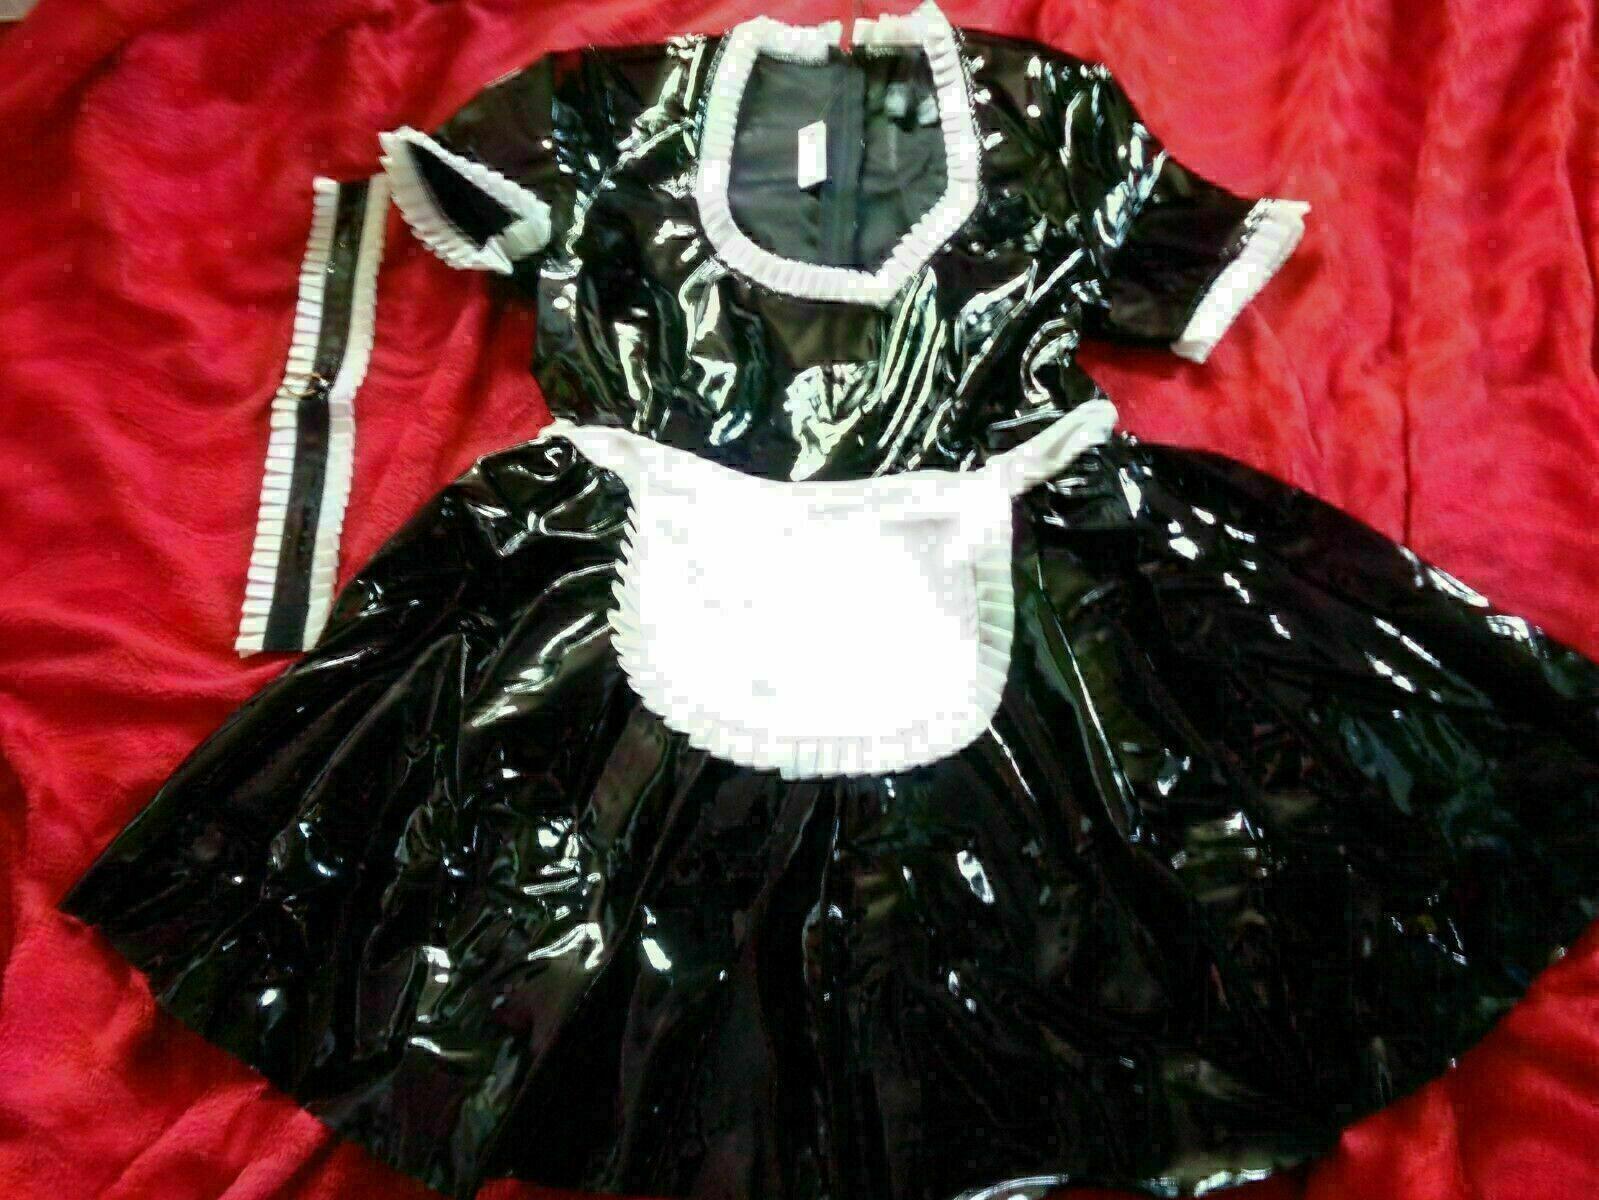 ANN SUMMER BLACK PVC MISTRESS MAID FANCY DRESS COSTUME SIZE M 12-14 NEW WITH TAG